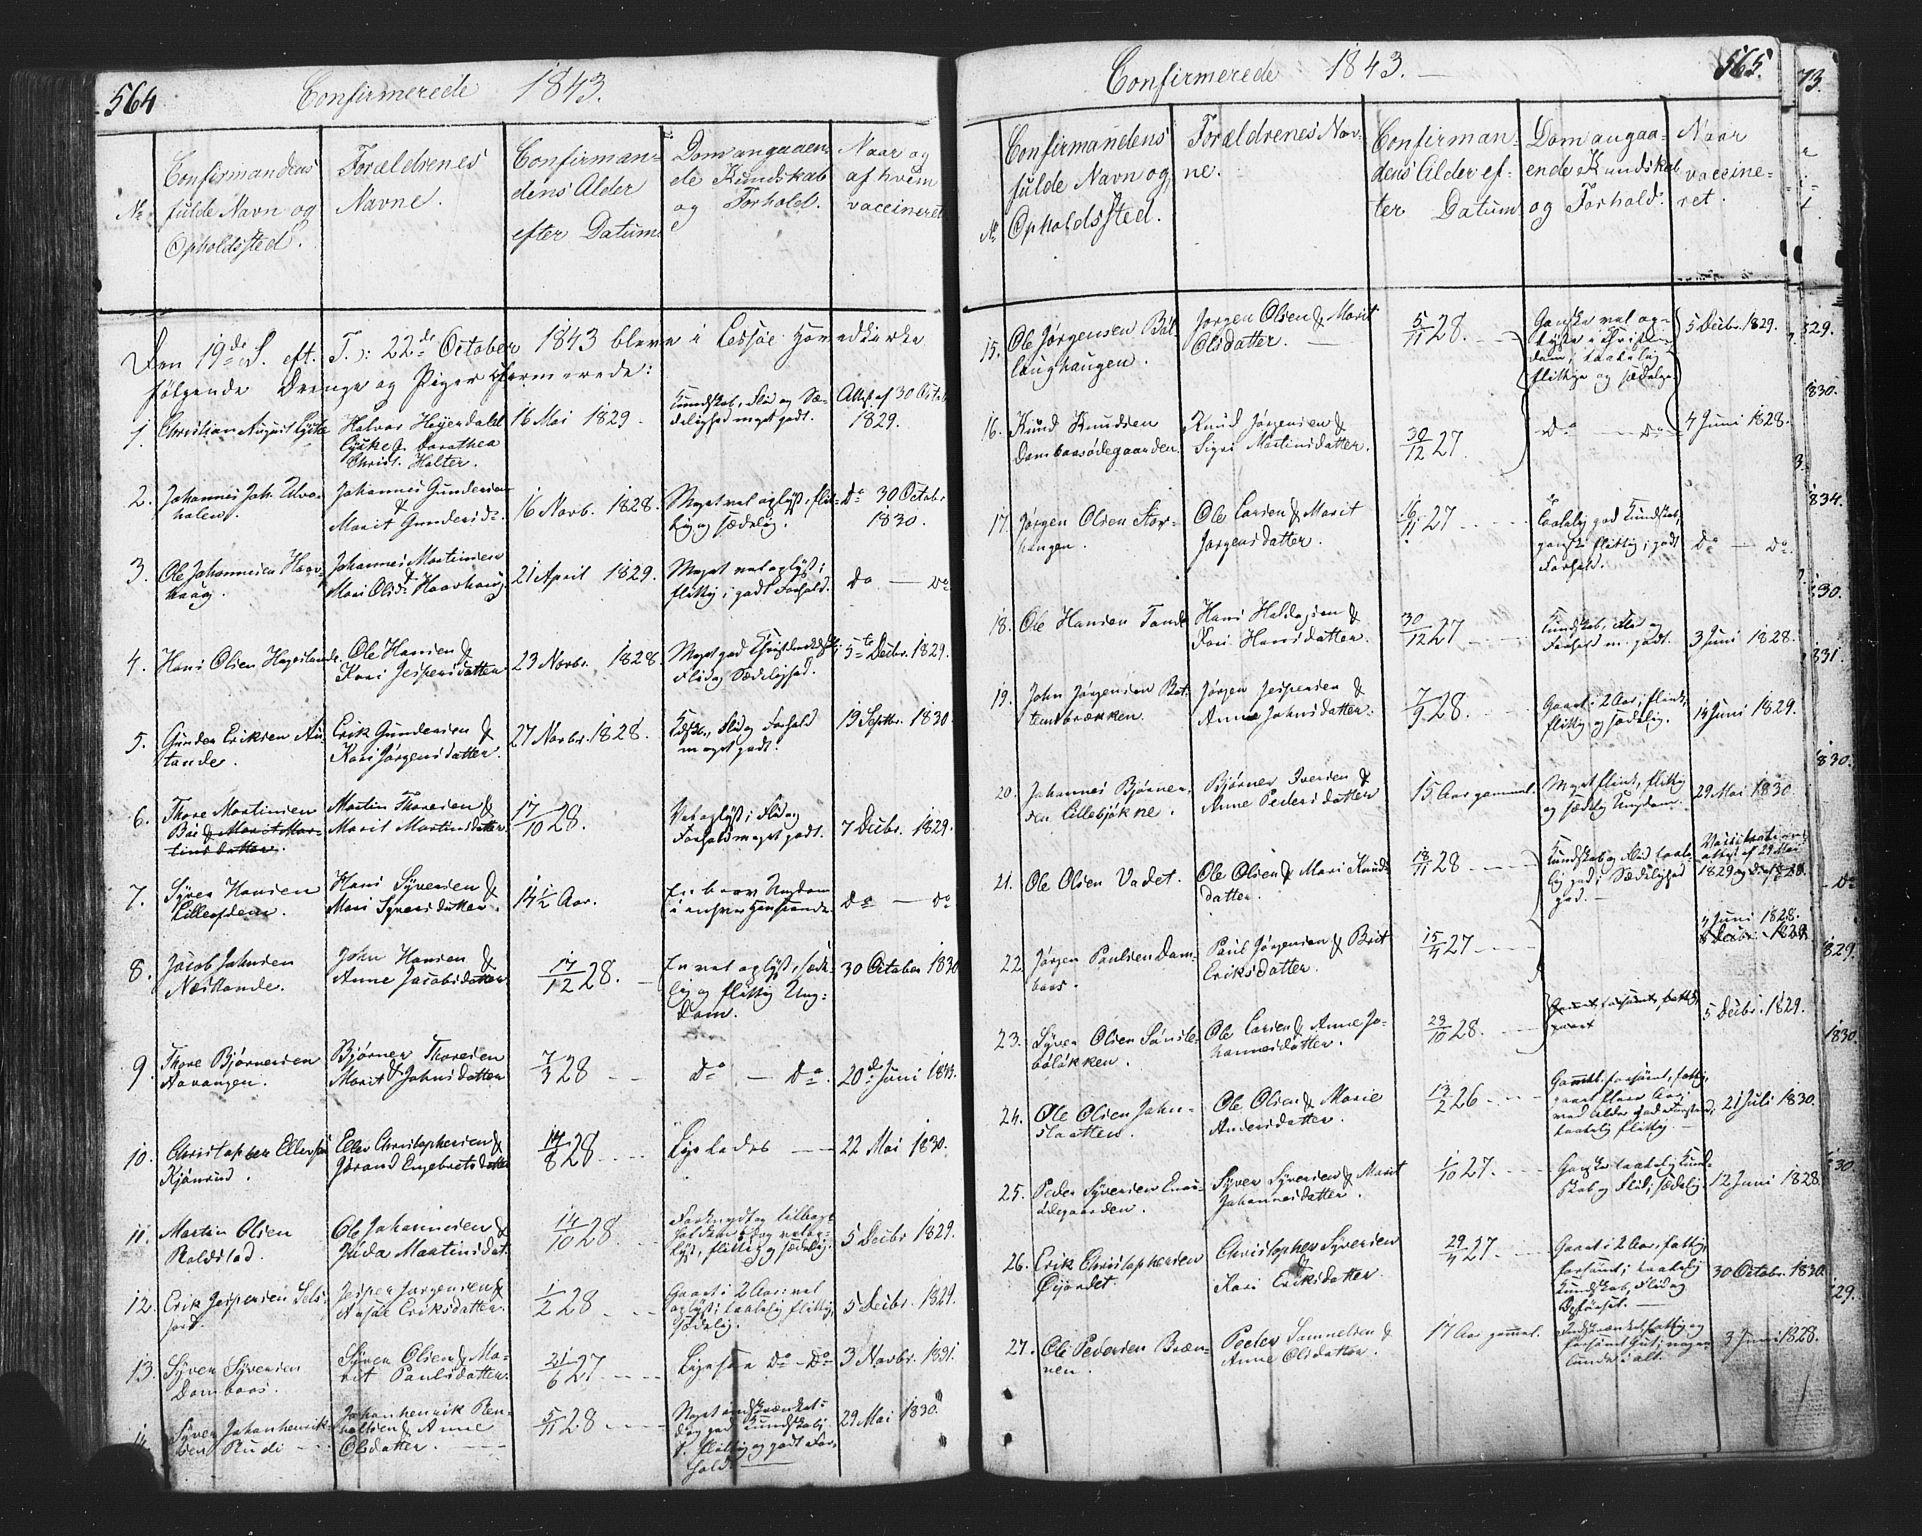 SAH, Lesja prestekontor, Klokkerbok nr. 2, 1832-1850, s. 564-565